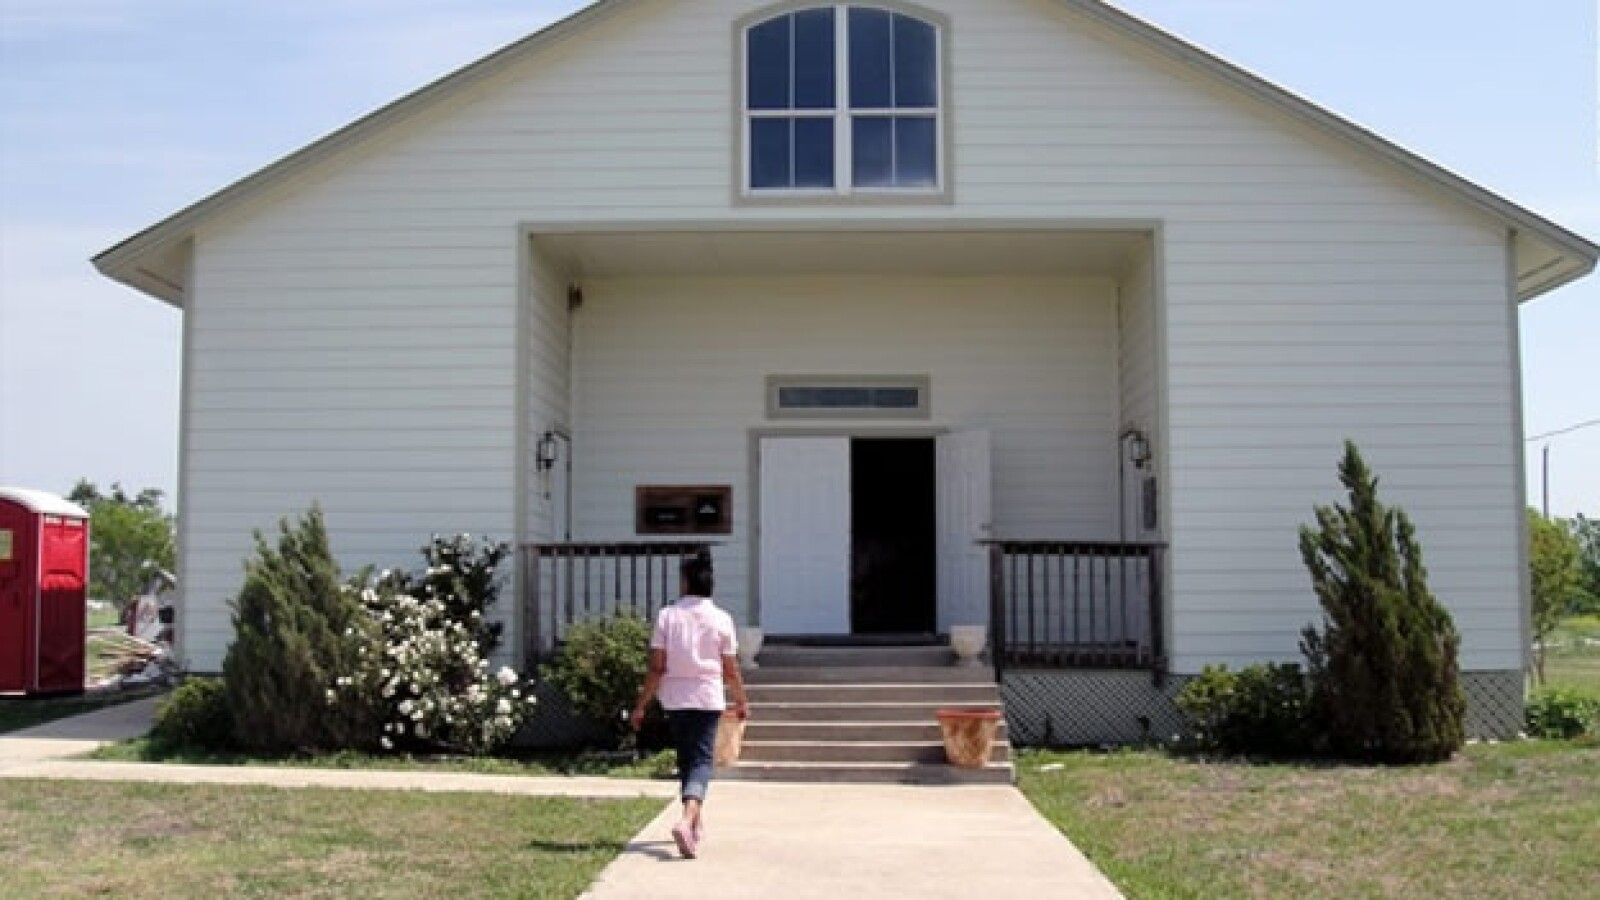 Waco - capilla - Sheila Martin